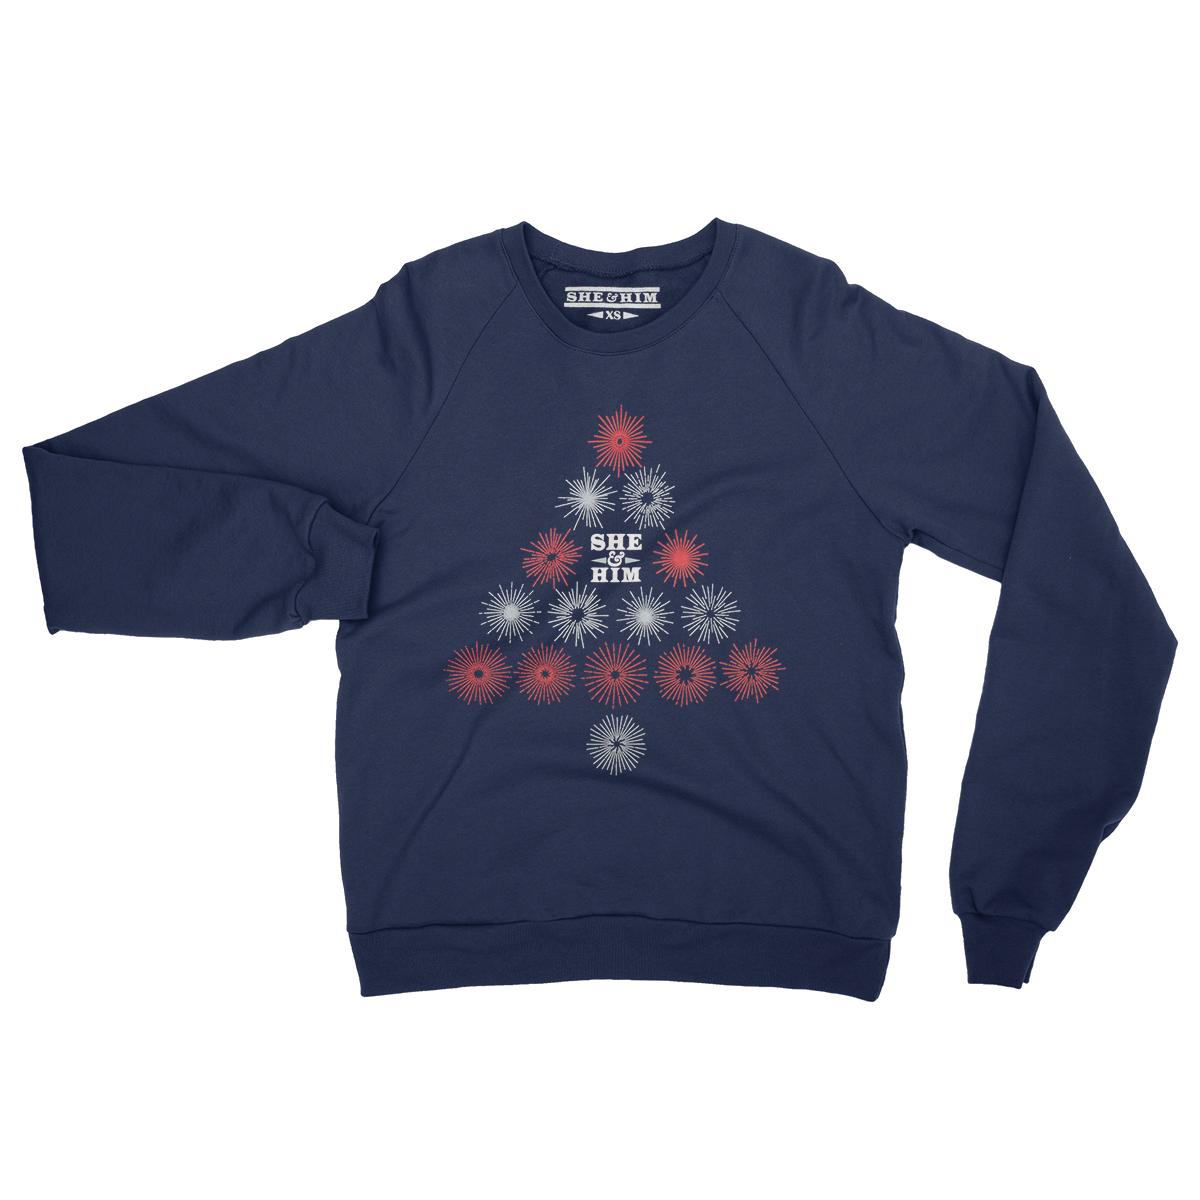 She & Him Christmas Unisex Crewneck Sweatshirt